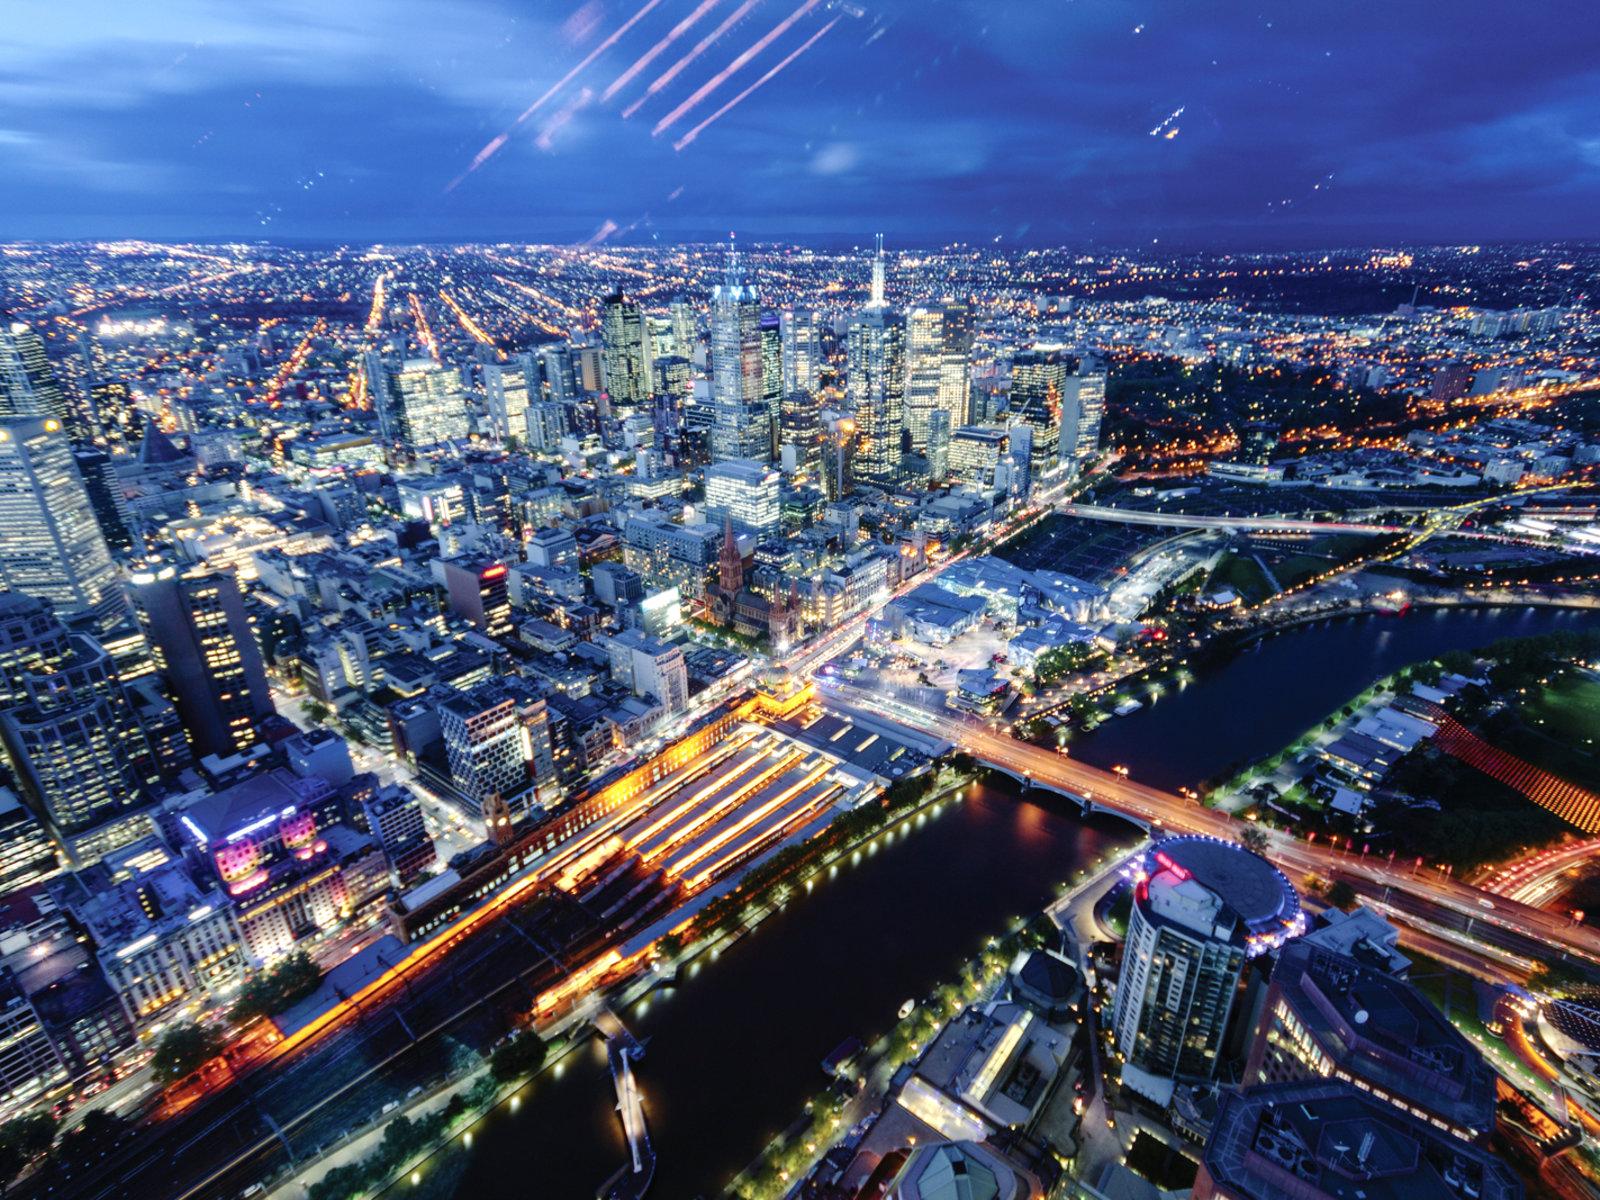 Melbourne © Tourism Australia, Roberto Seba